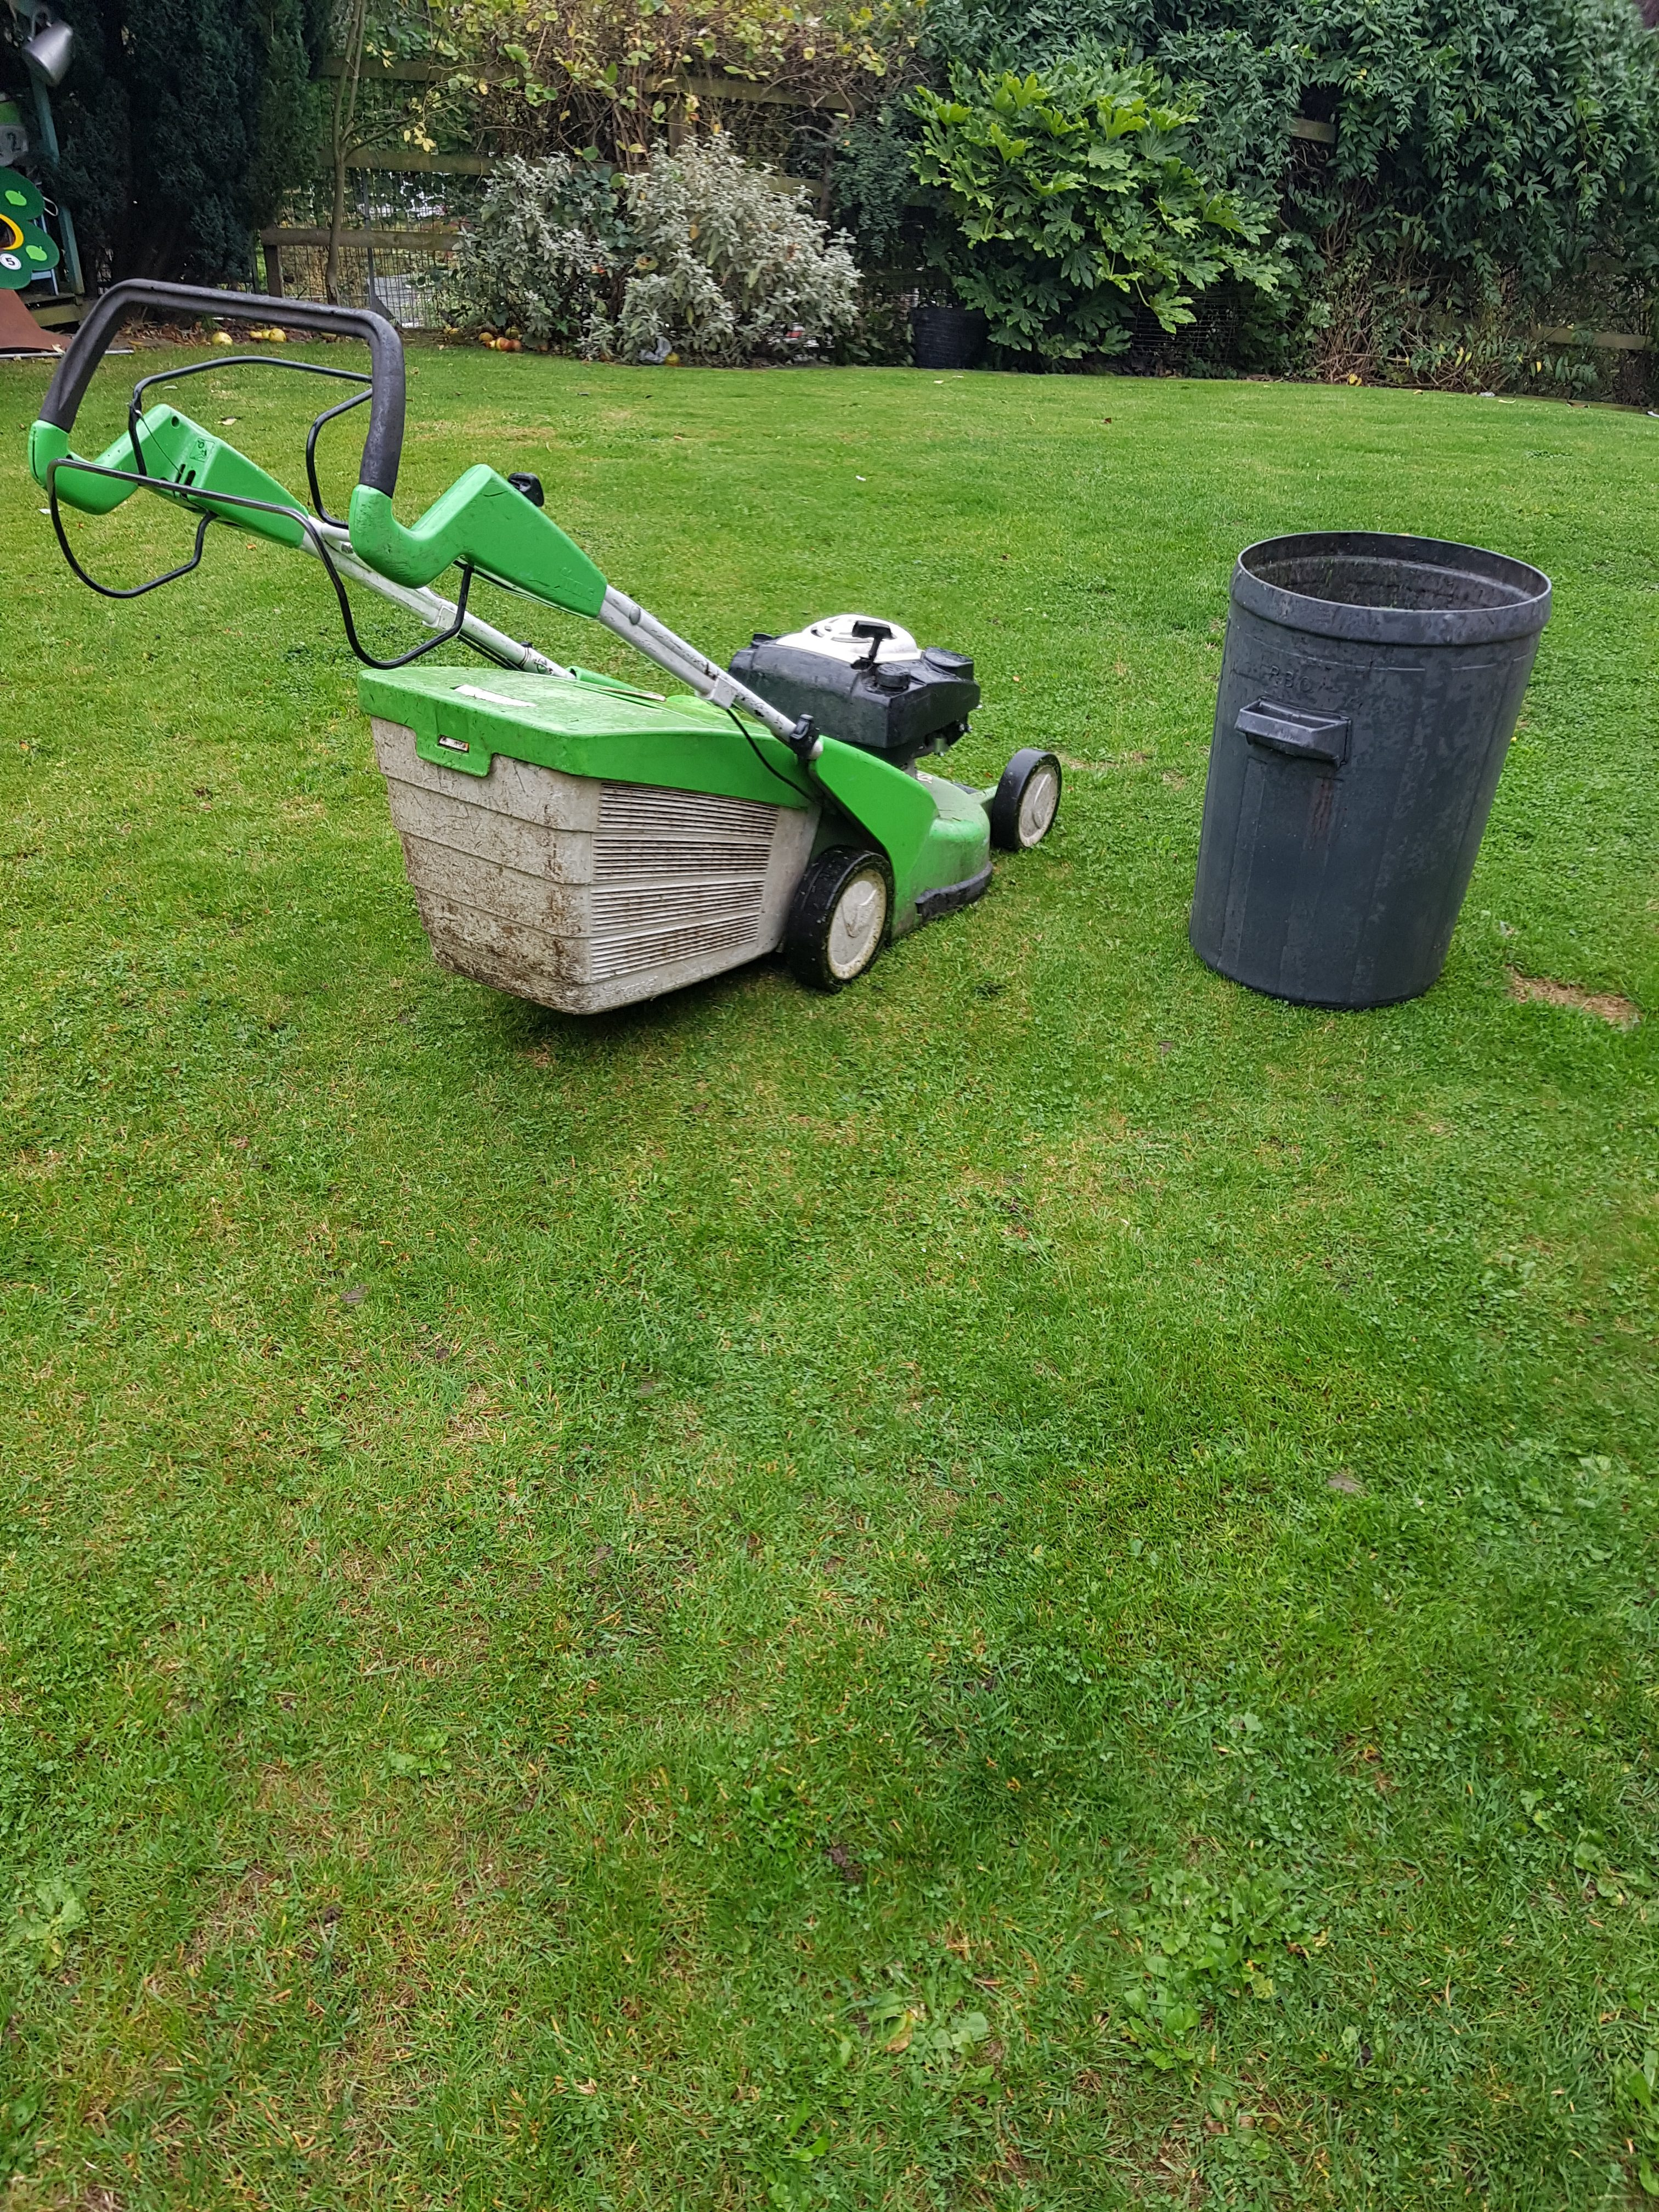 Lawn mow